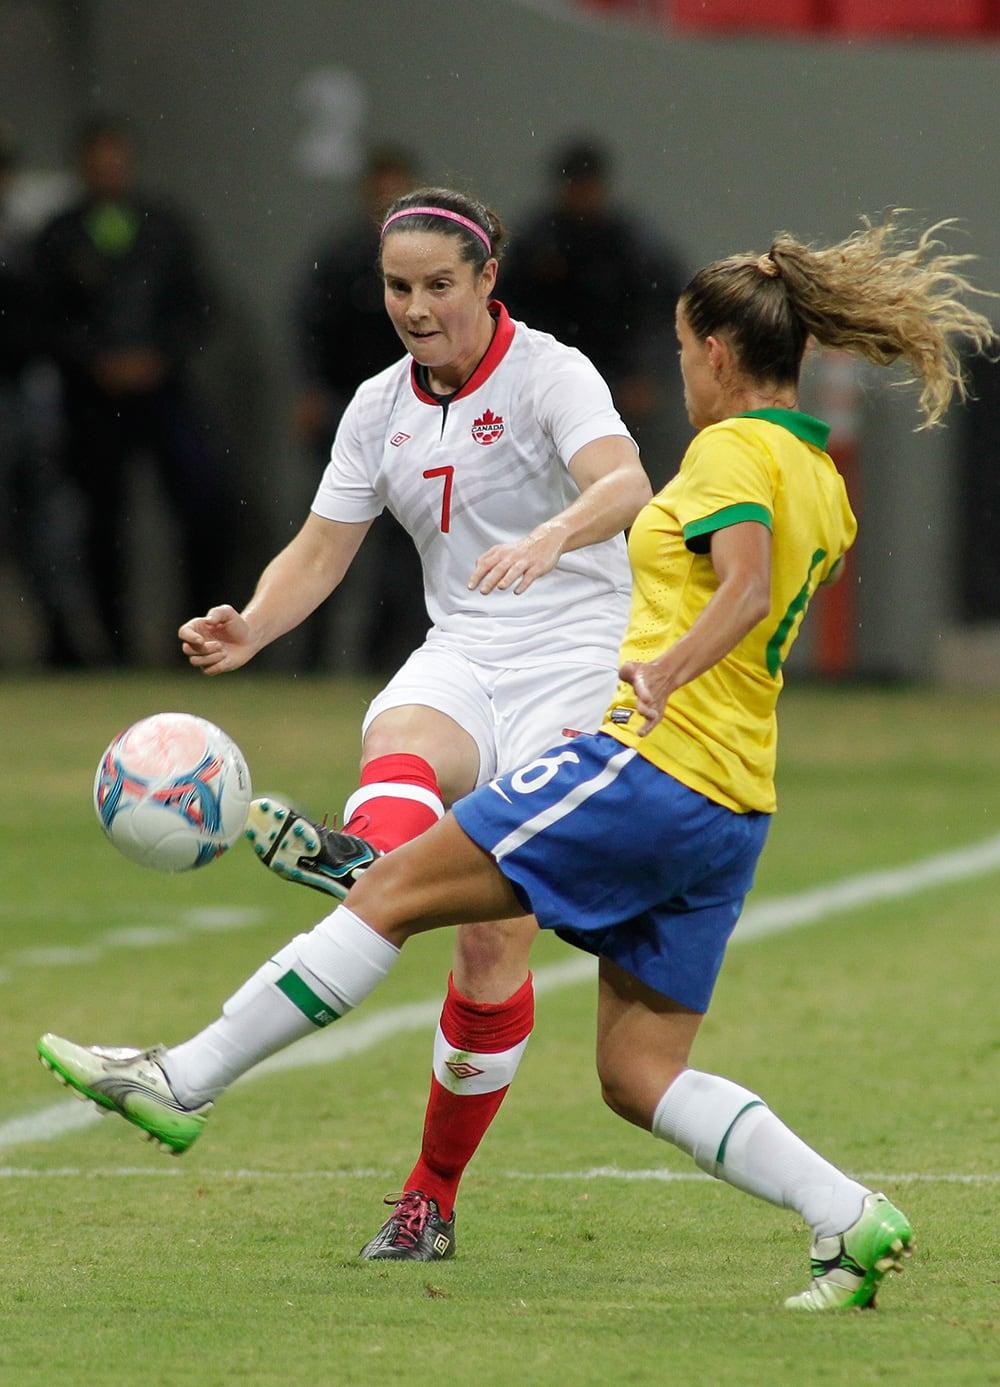 Canada`s Rhian Wilkinson (7) kicks the ball past Brazil's Tamires Cassia, during a soccer match at the International Women`s Football Tournament in Brasilia, Brazil.